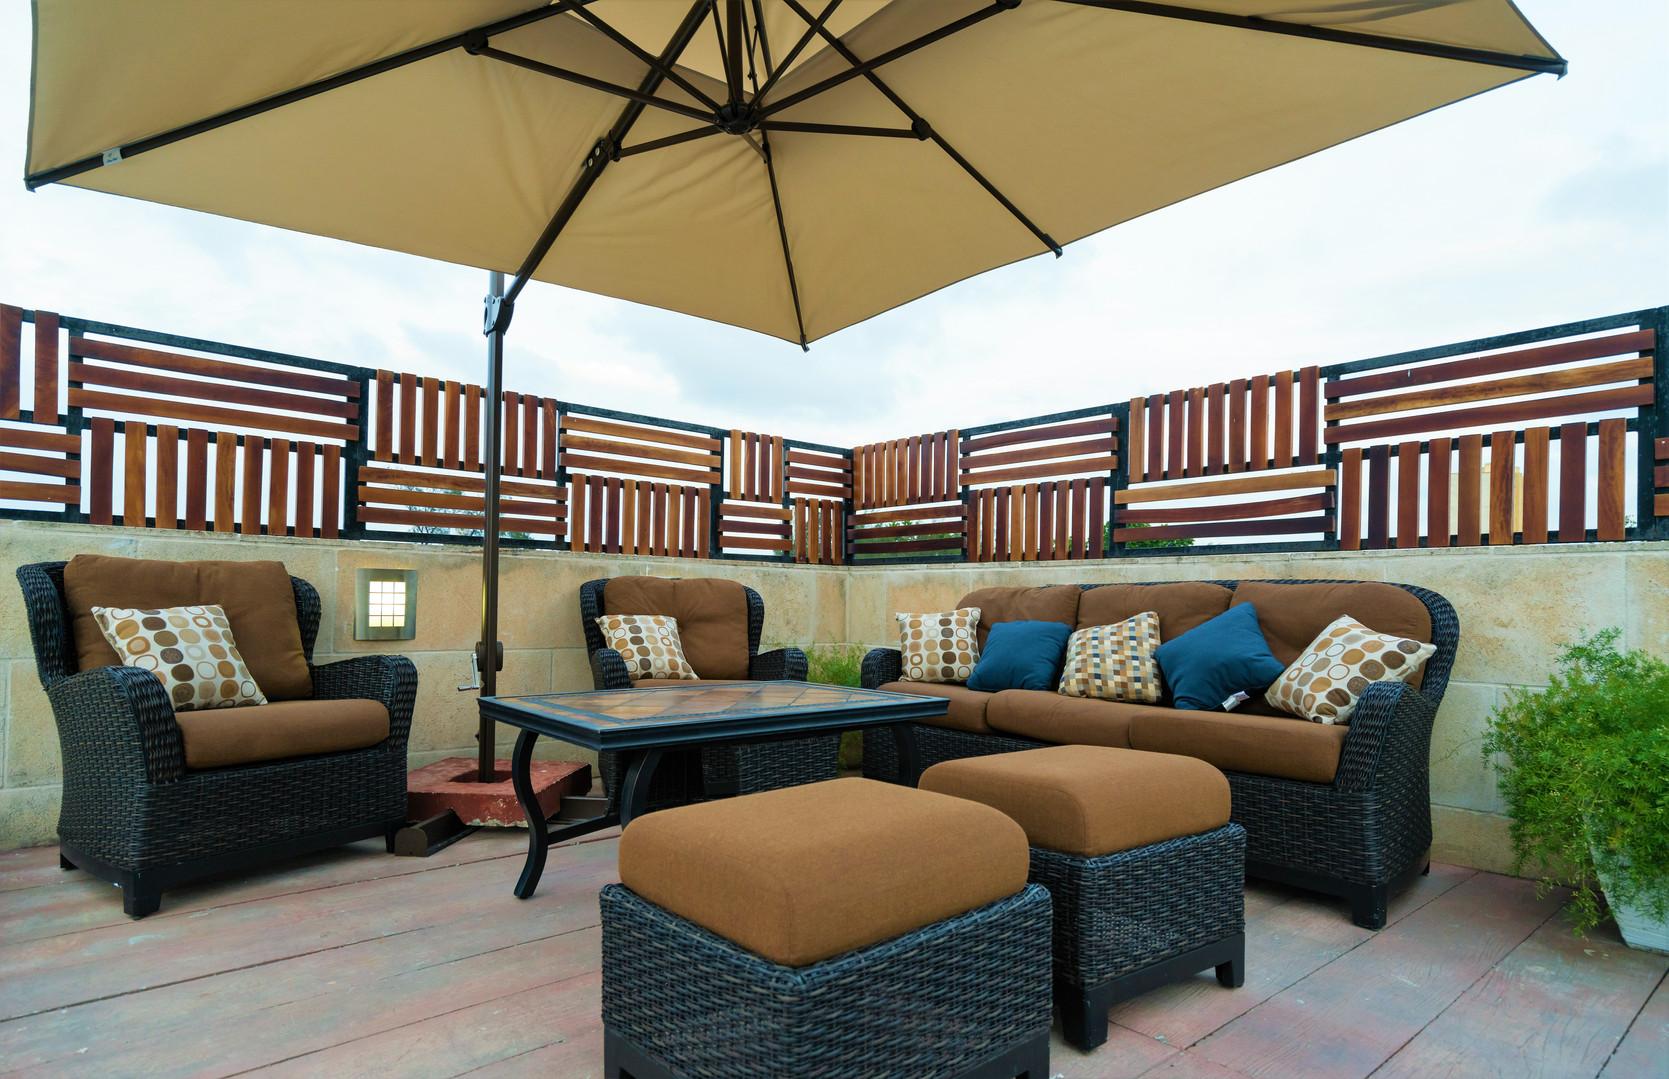 El Candil Boutique Hotel Rooftop Bar & Grill